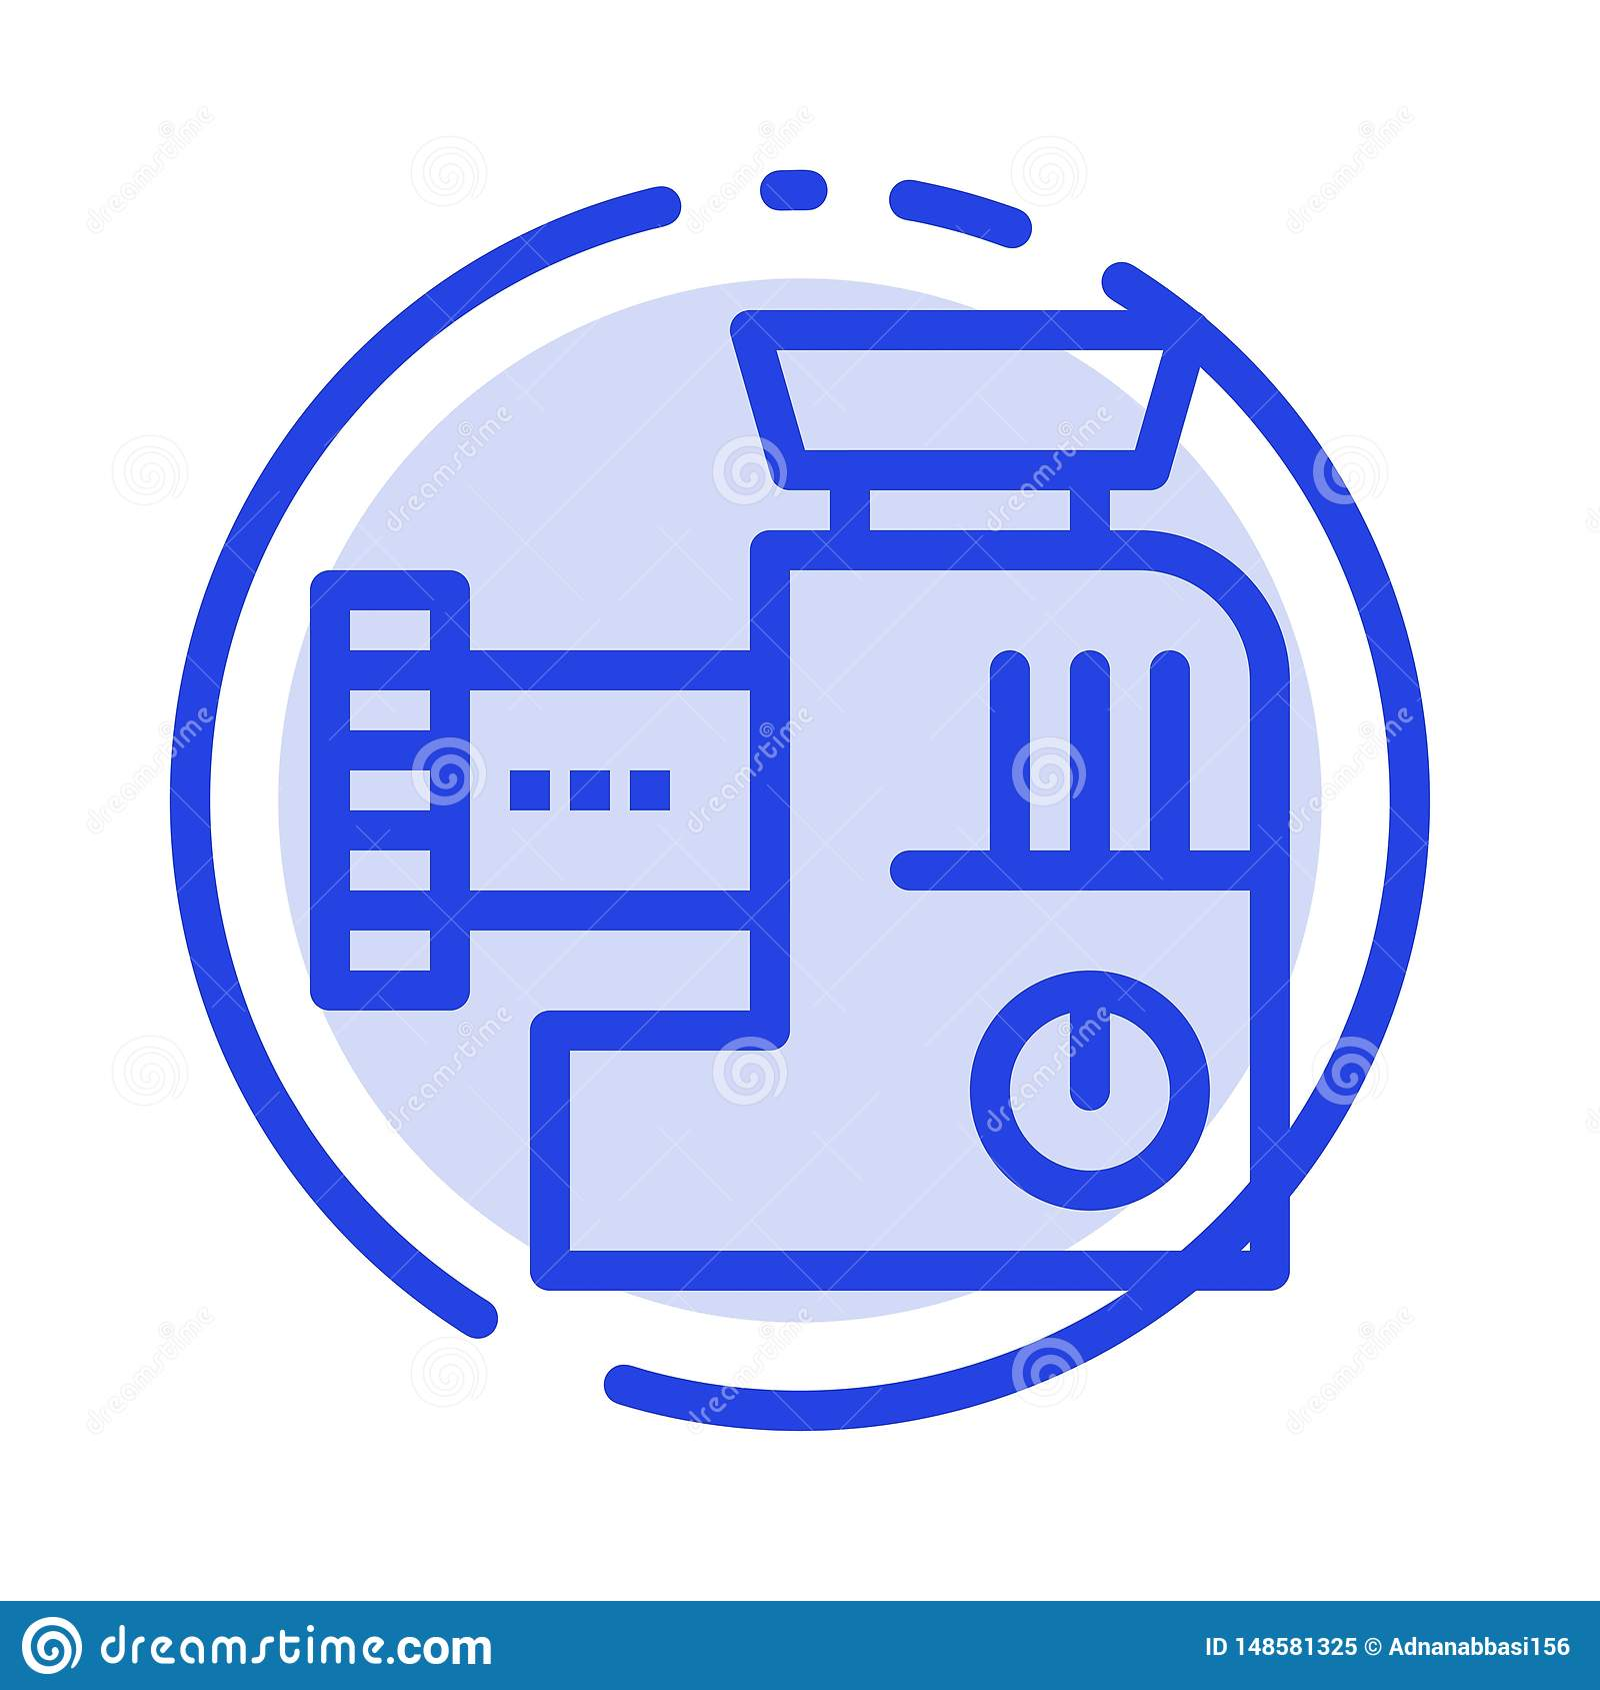 Miscelatore, cucina, manuale, linea punteggiata blu linea icona della miscela